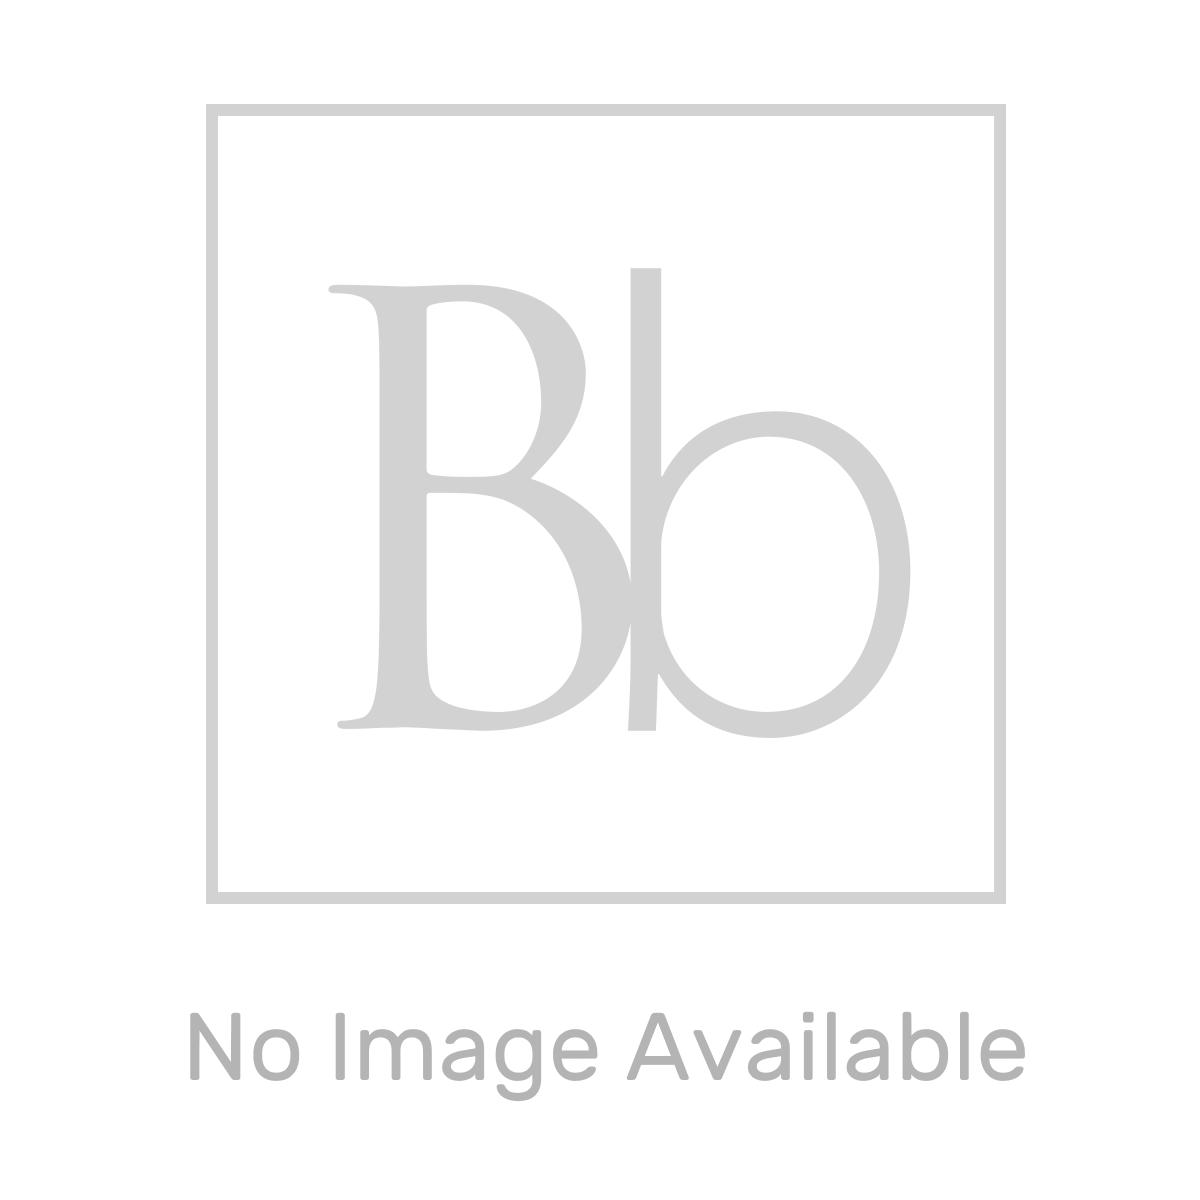 RAK Feeling Grey Square Single Outlet Thermostatic Shower Valve Measurements